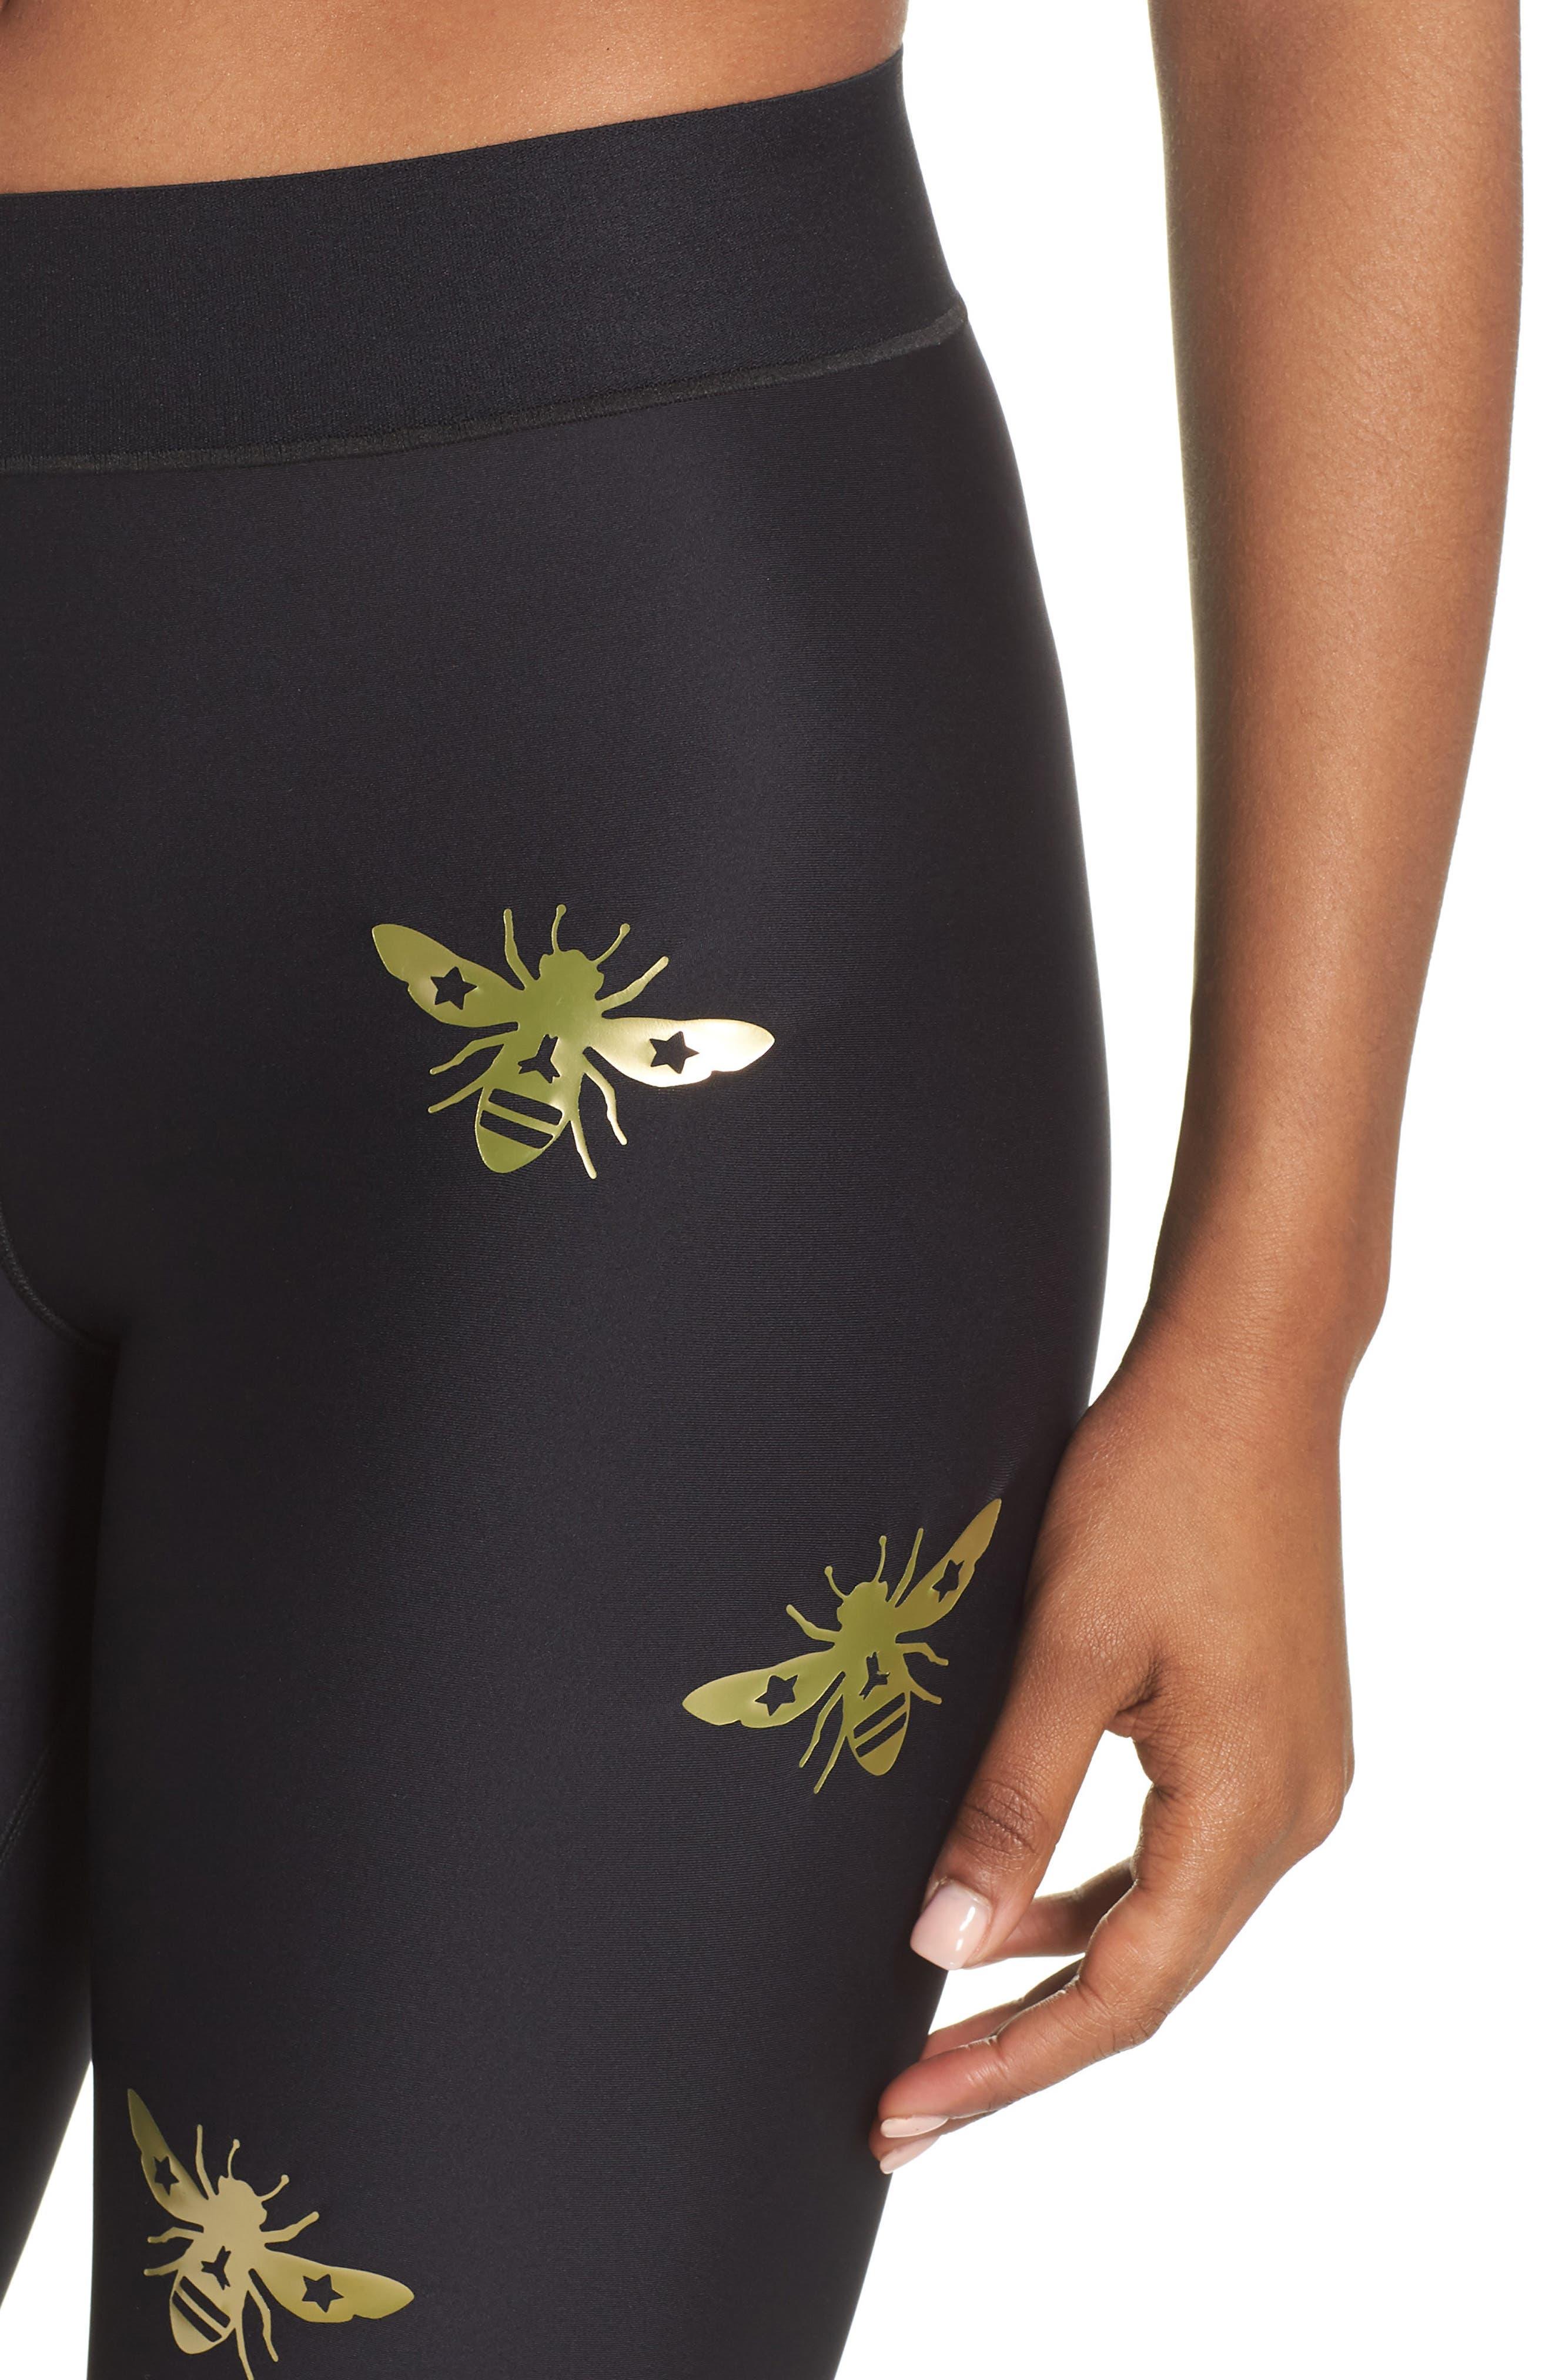 Ultra Bee Leggings,                             Alternate thumbnail 4, color,                             Nero/ Gold